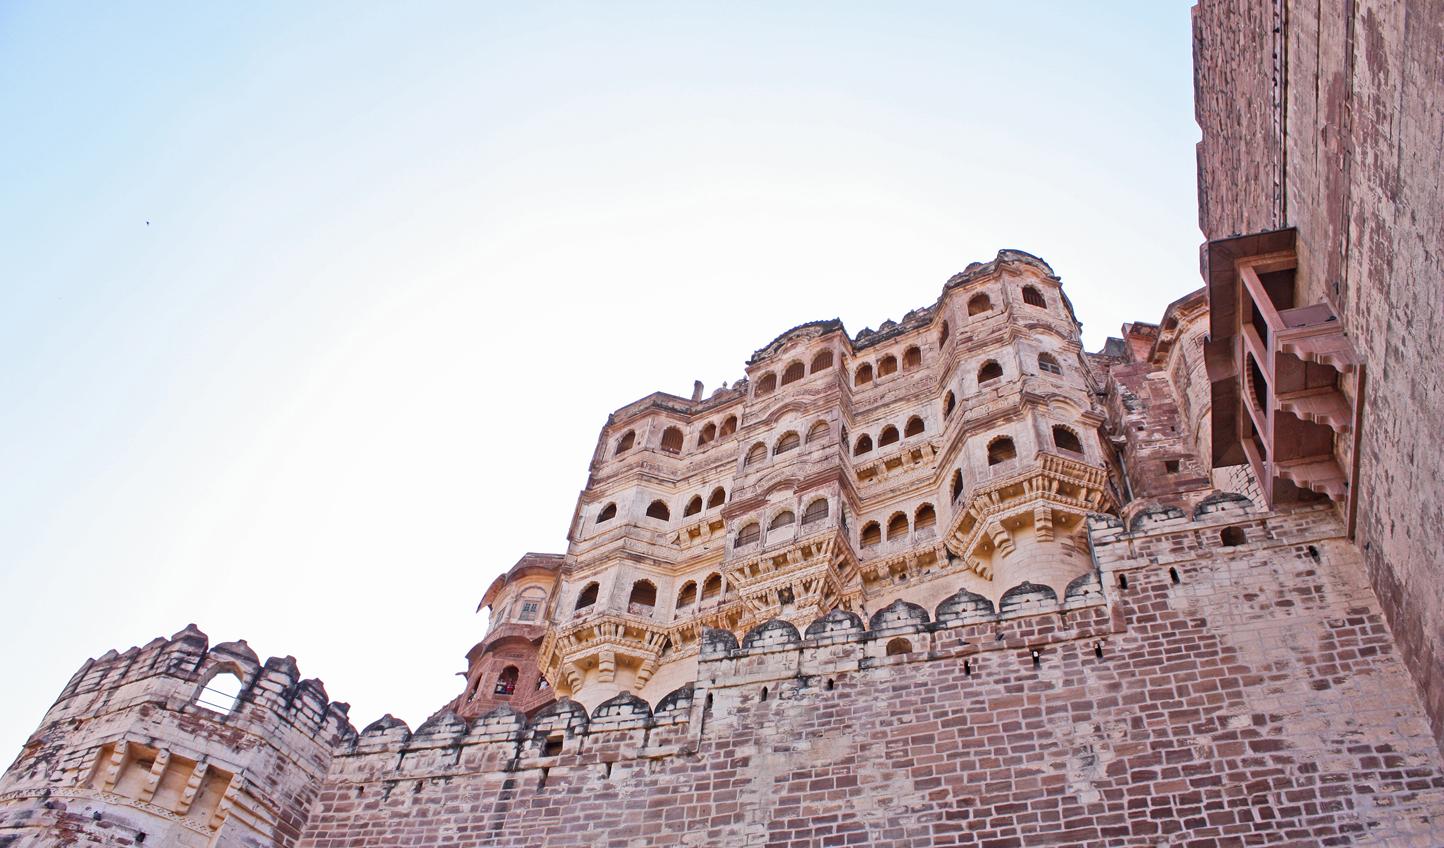 Get behind the walls of Mehrangarh Fort